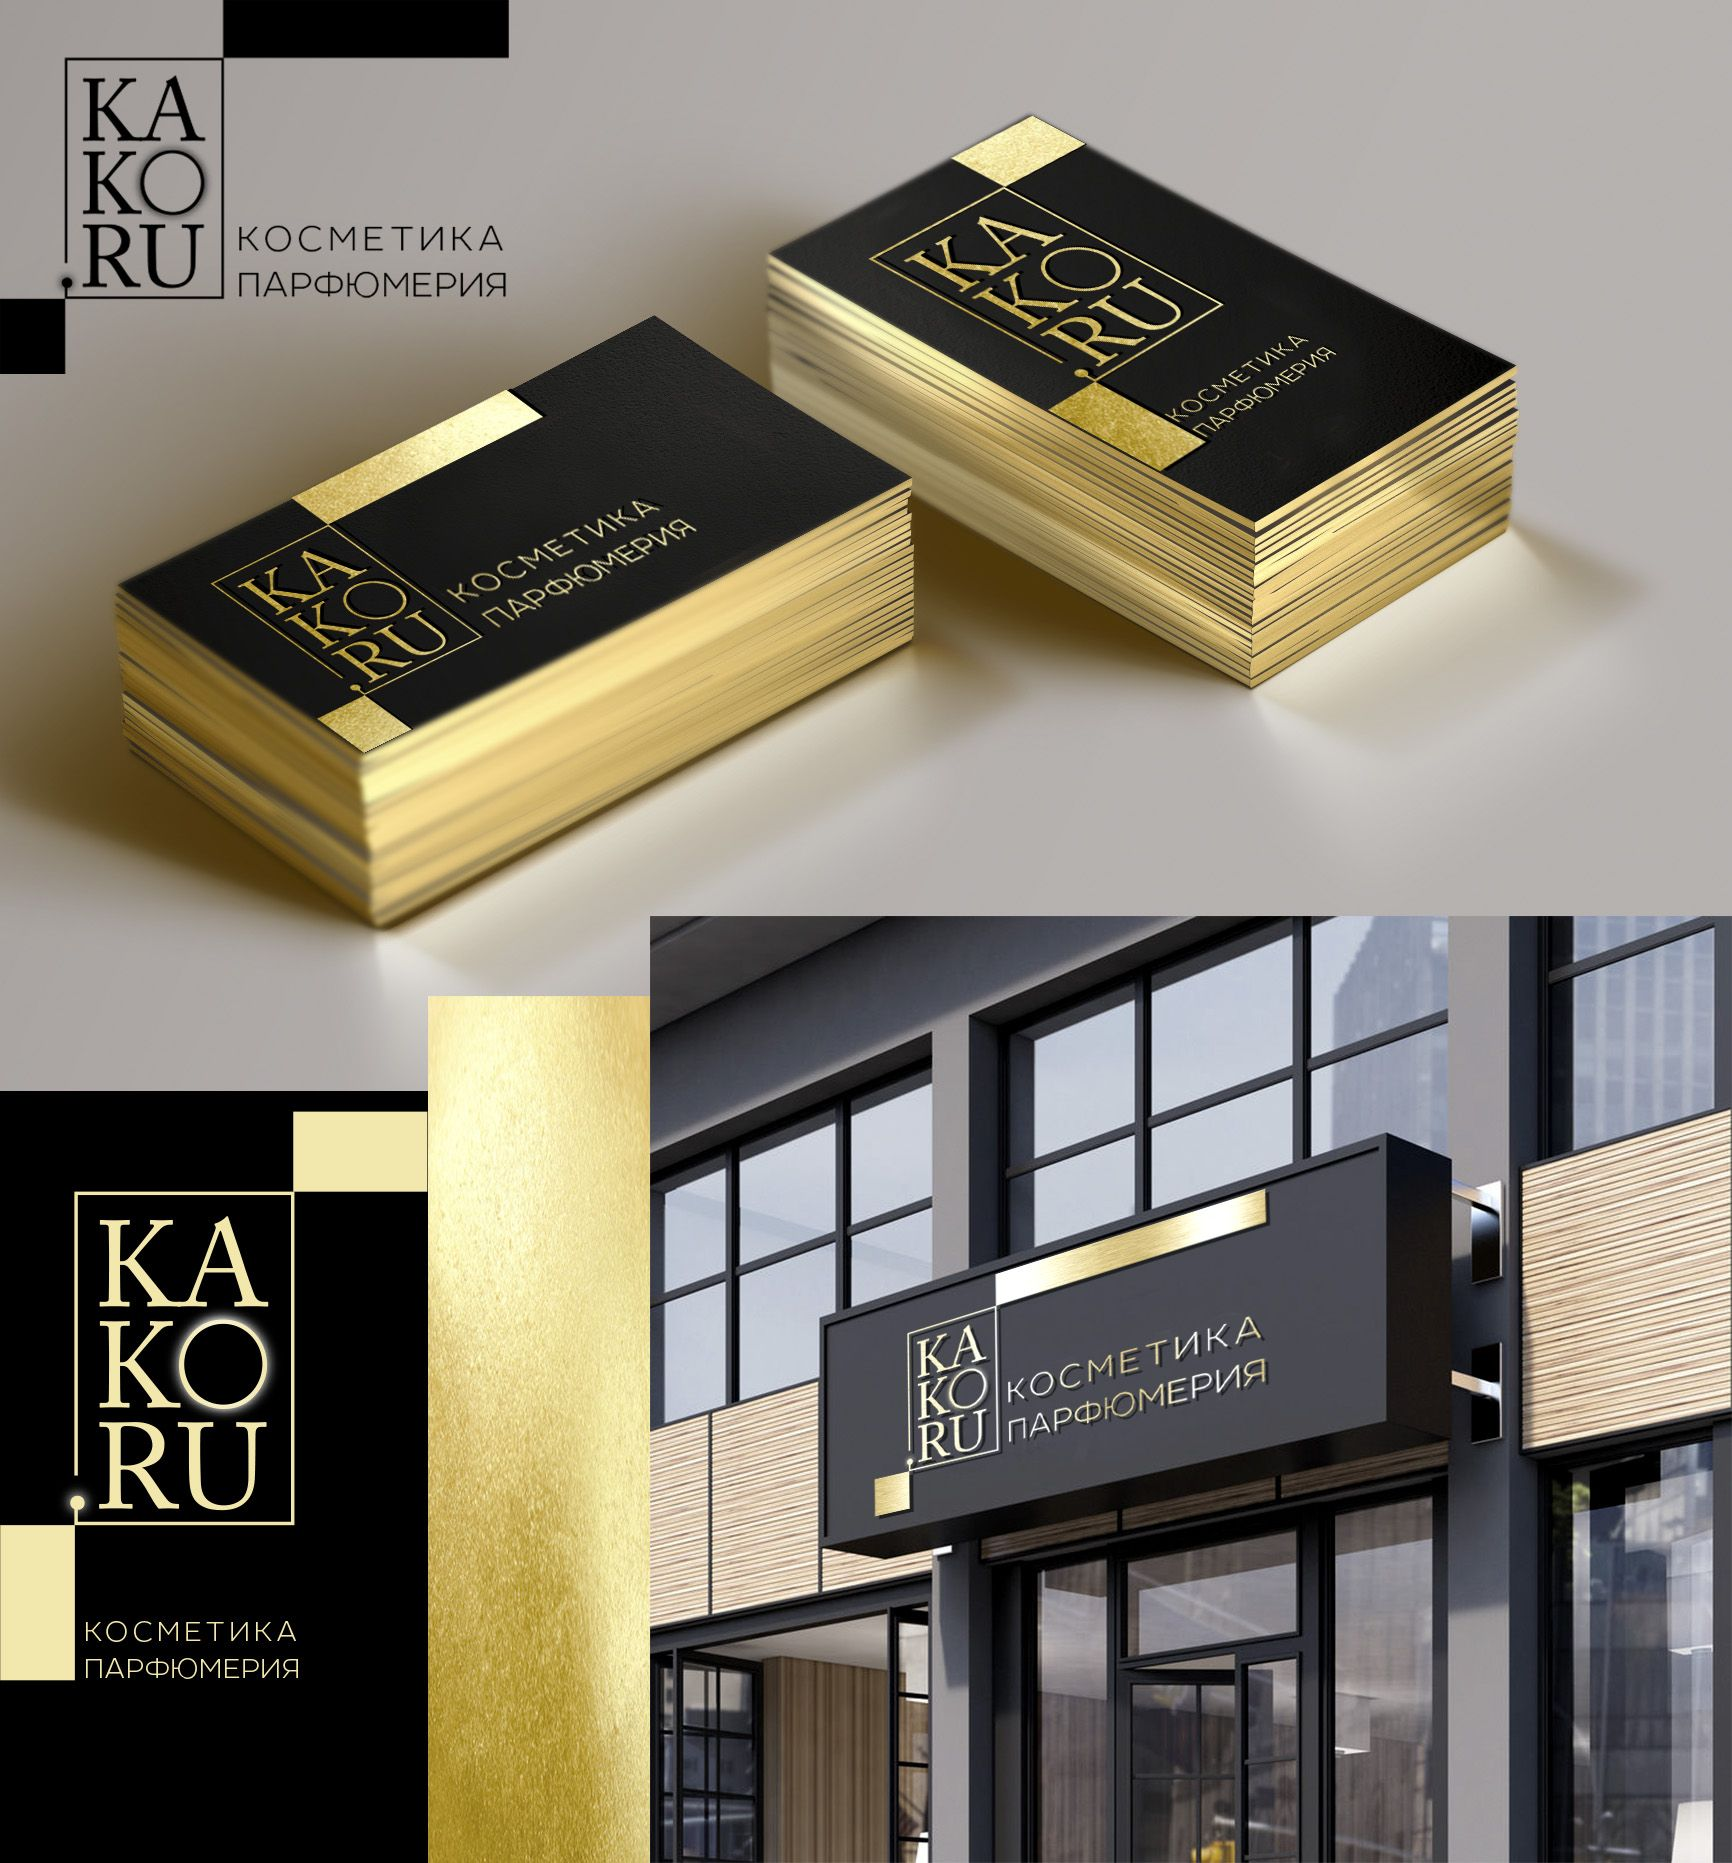 Design business cards#айдентика #creative #графический_дизайн #фотограф #digitalart #детскиймагазин #текстиль #logotypes # #instadesign #логотипыназаказ